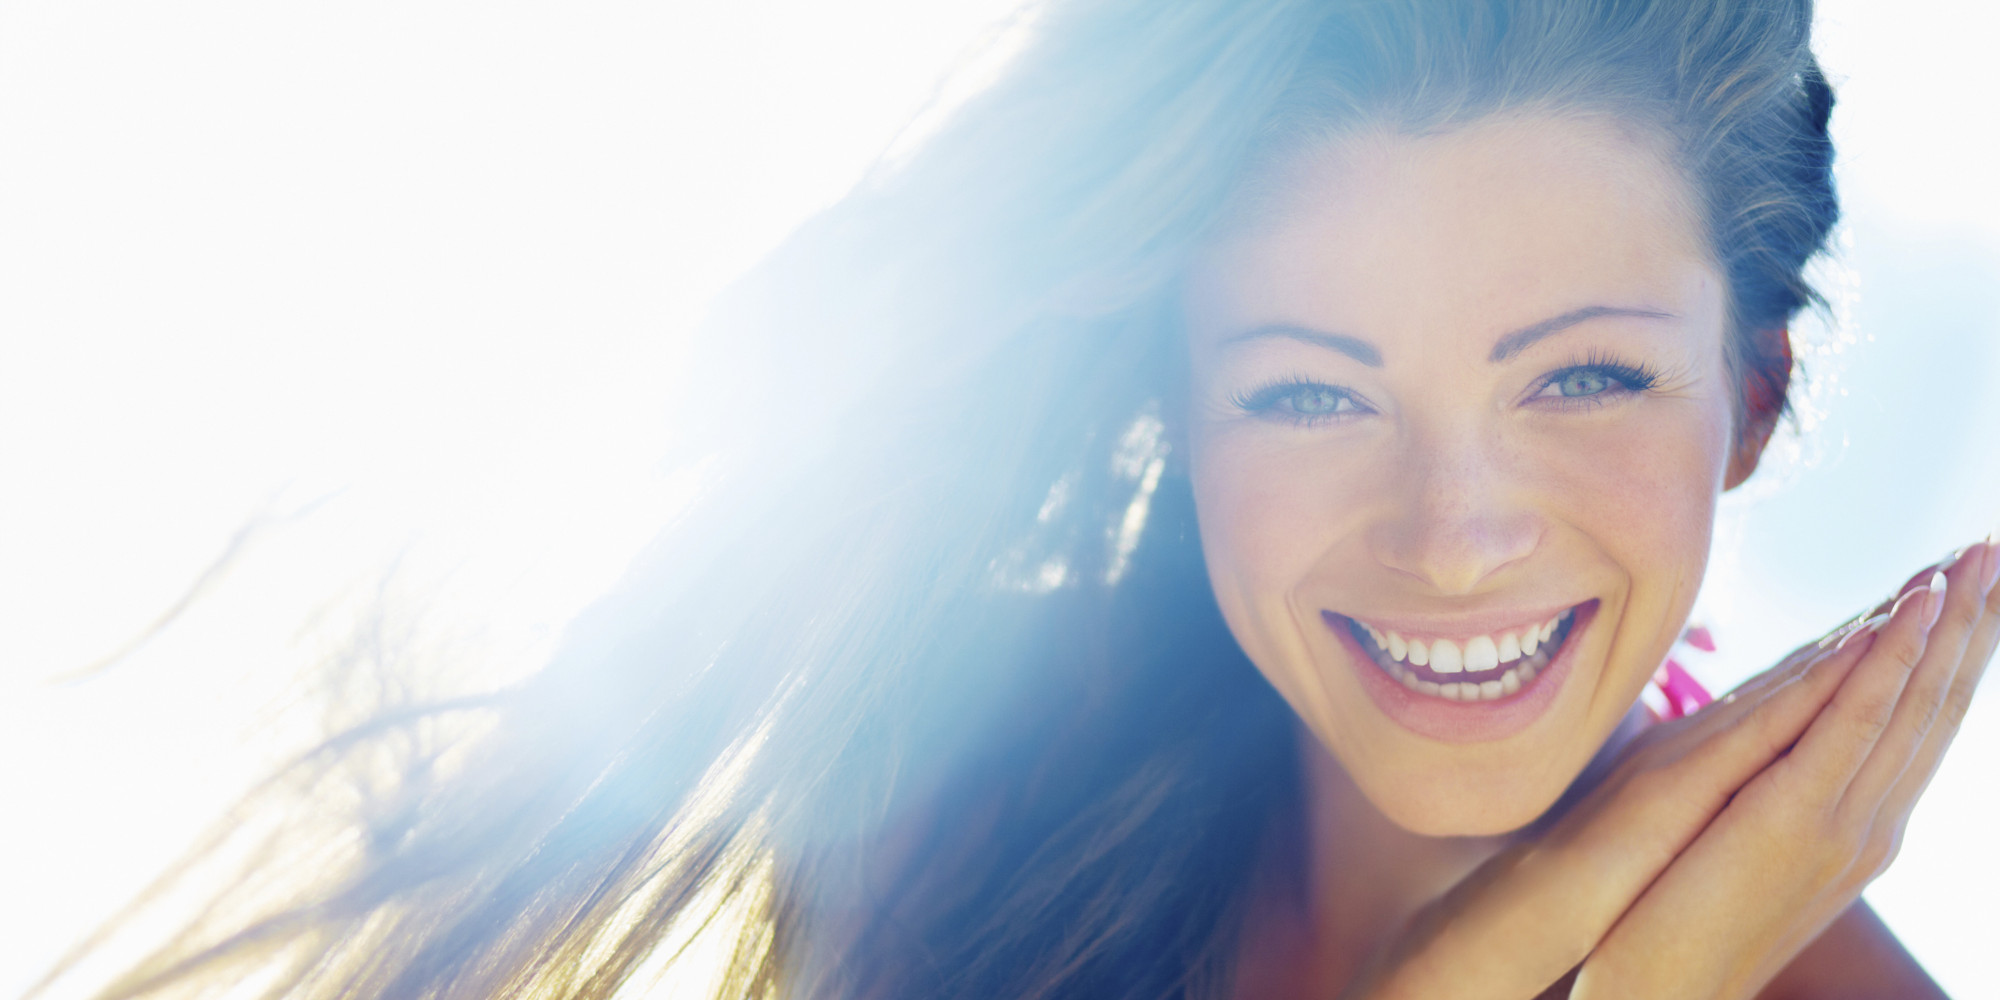 chica sonriendo feliz